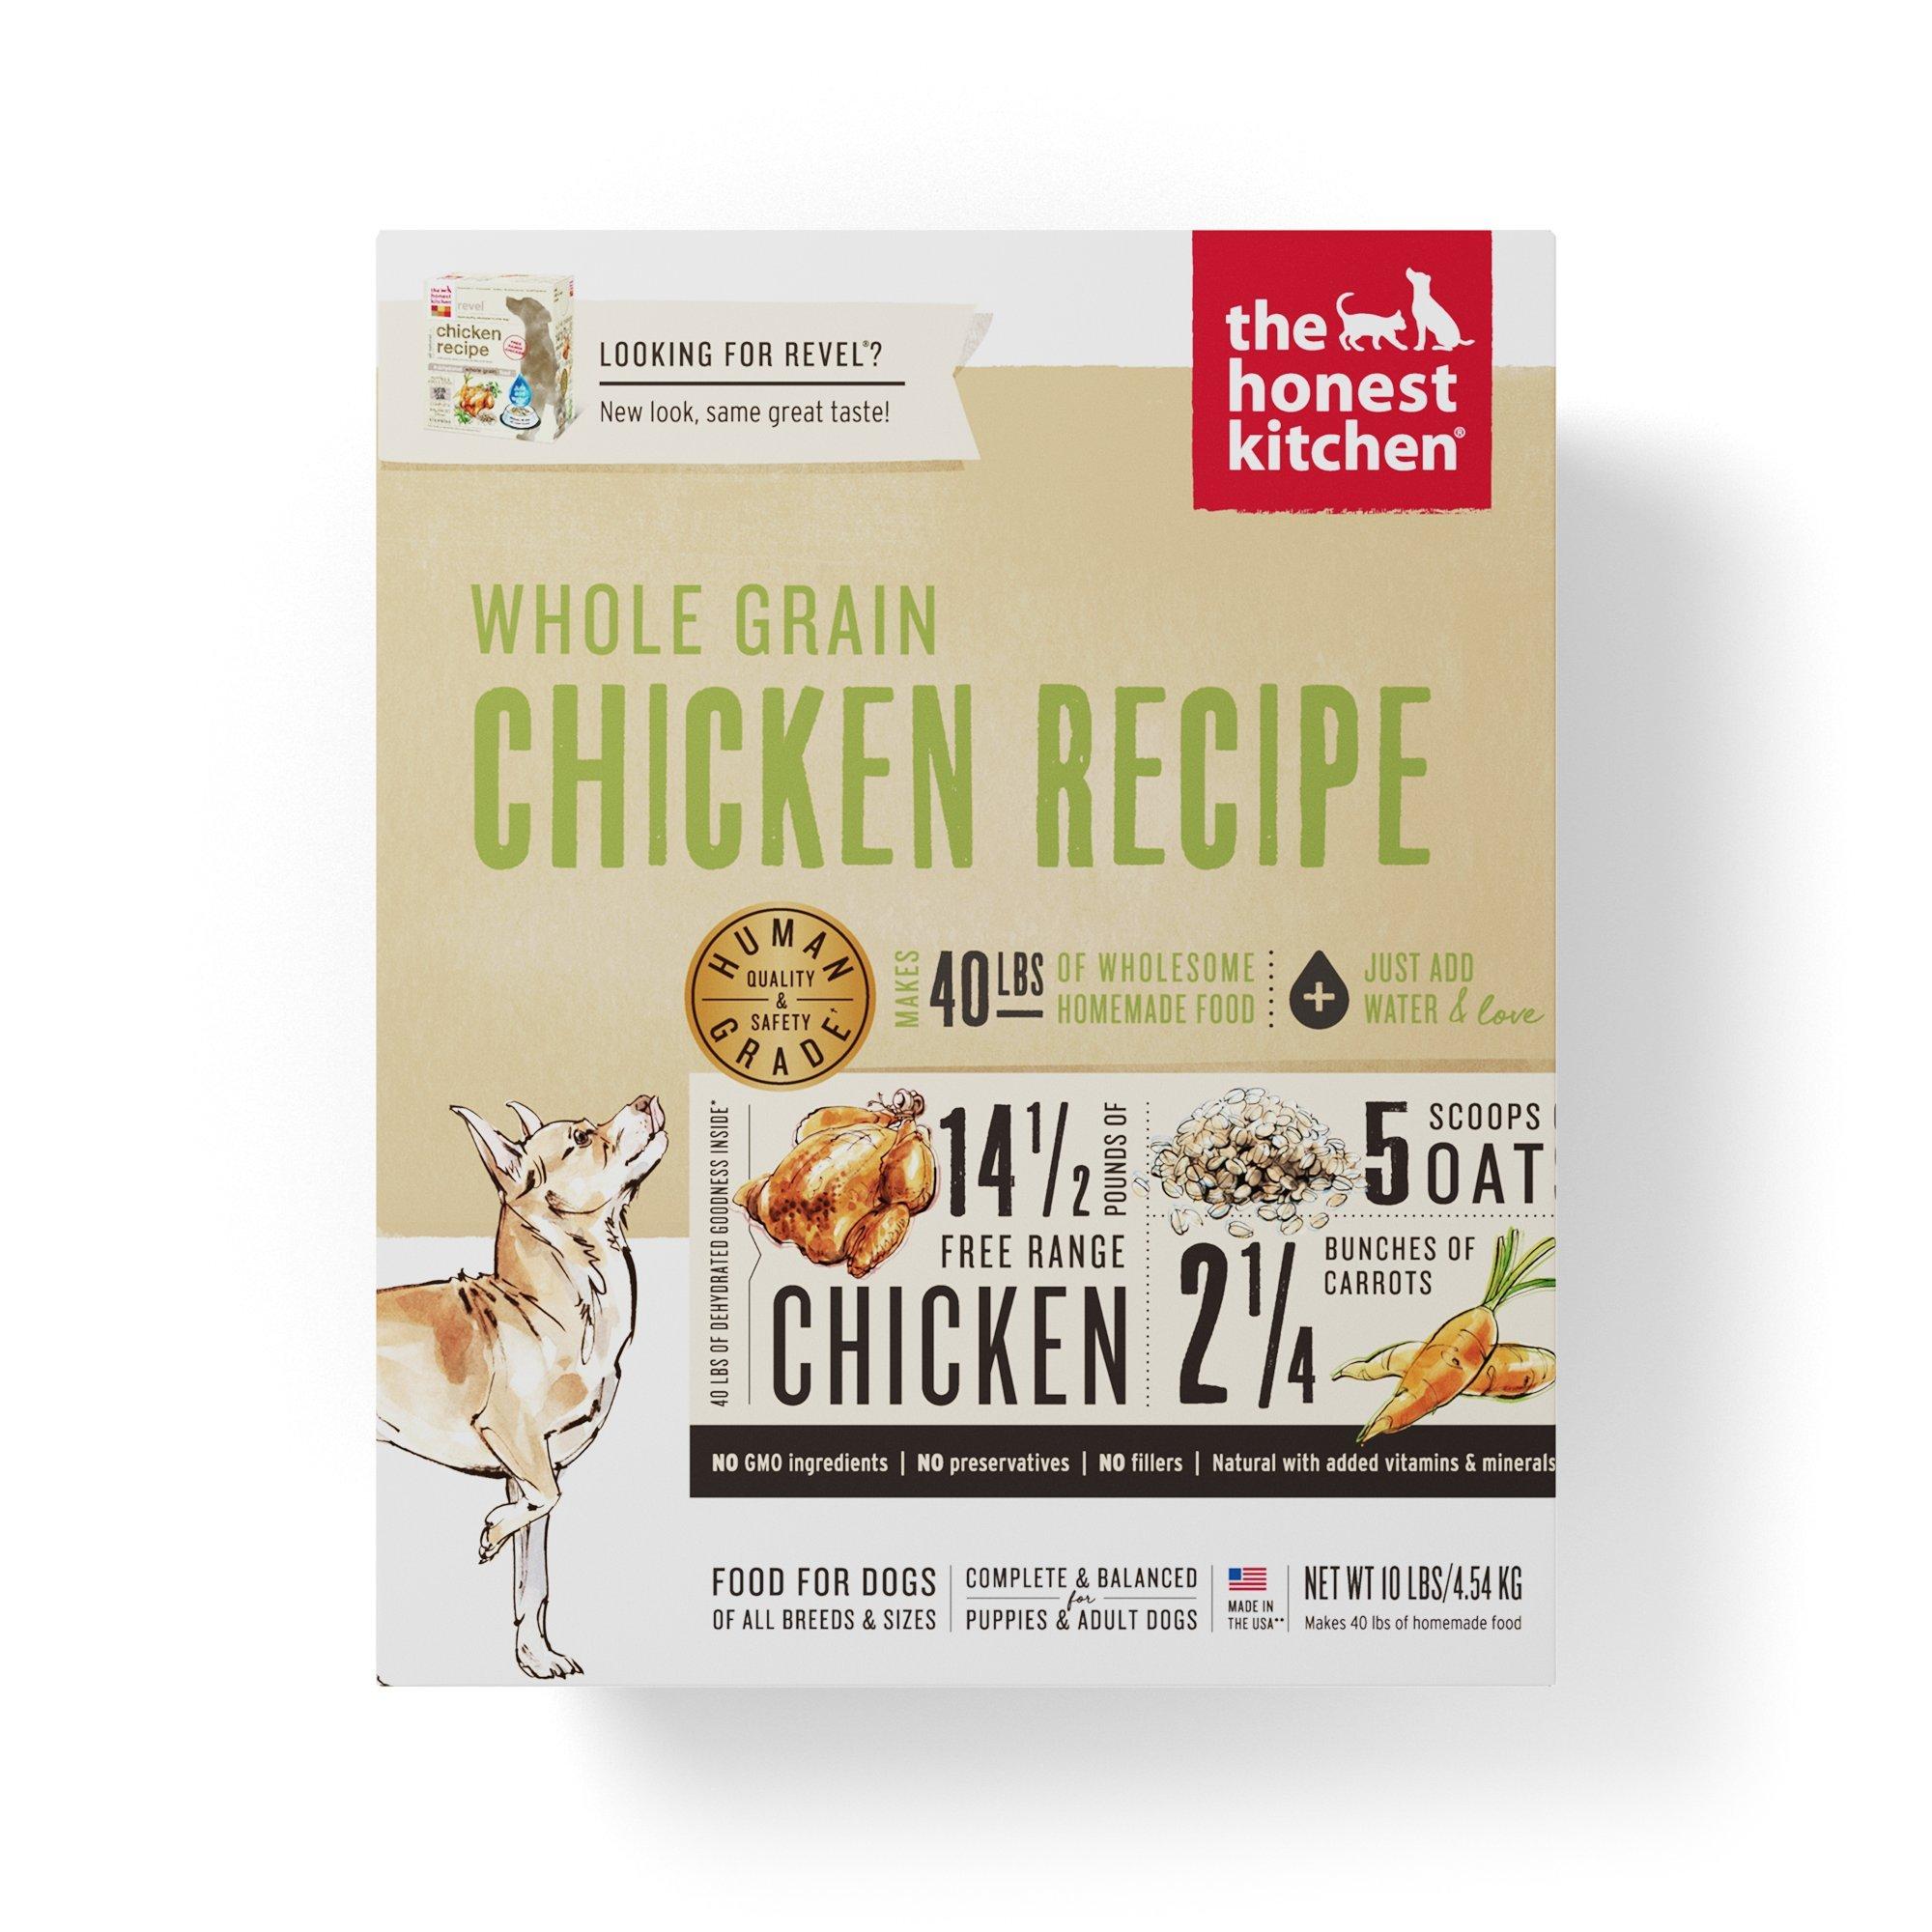 Honest Kitchen The Human Grade Dehydrated Organic Grain Chicken Dog Food, 10 lb Box - Revel